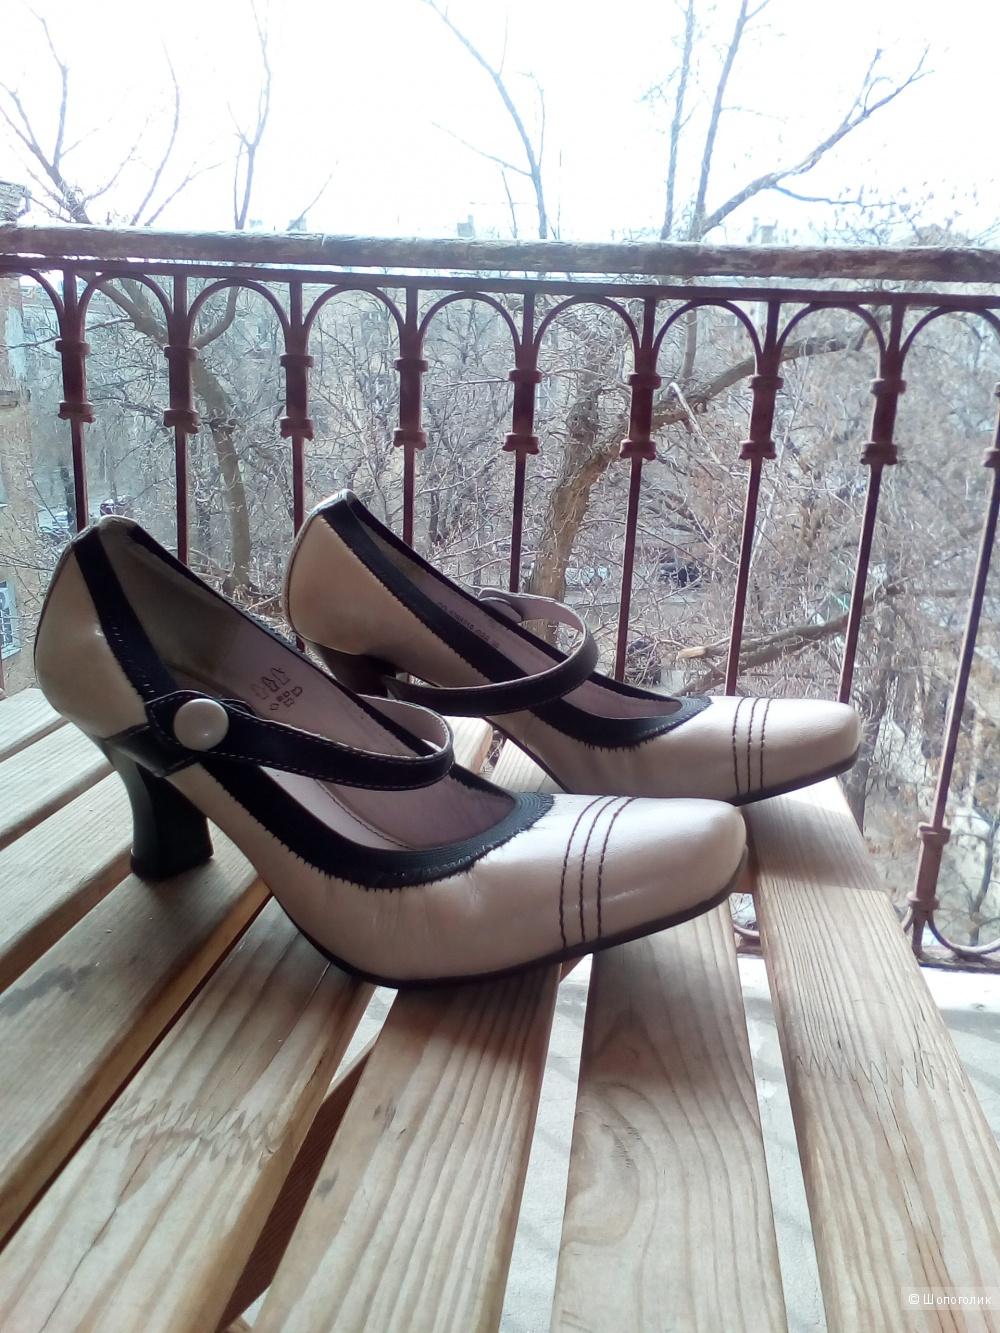 Туфли CHESTER,модель Мэри Джейн,39